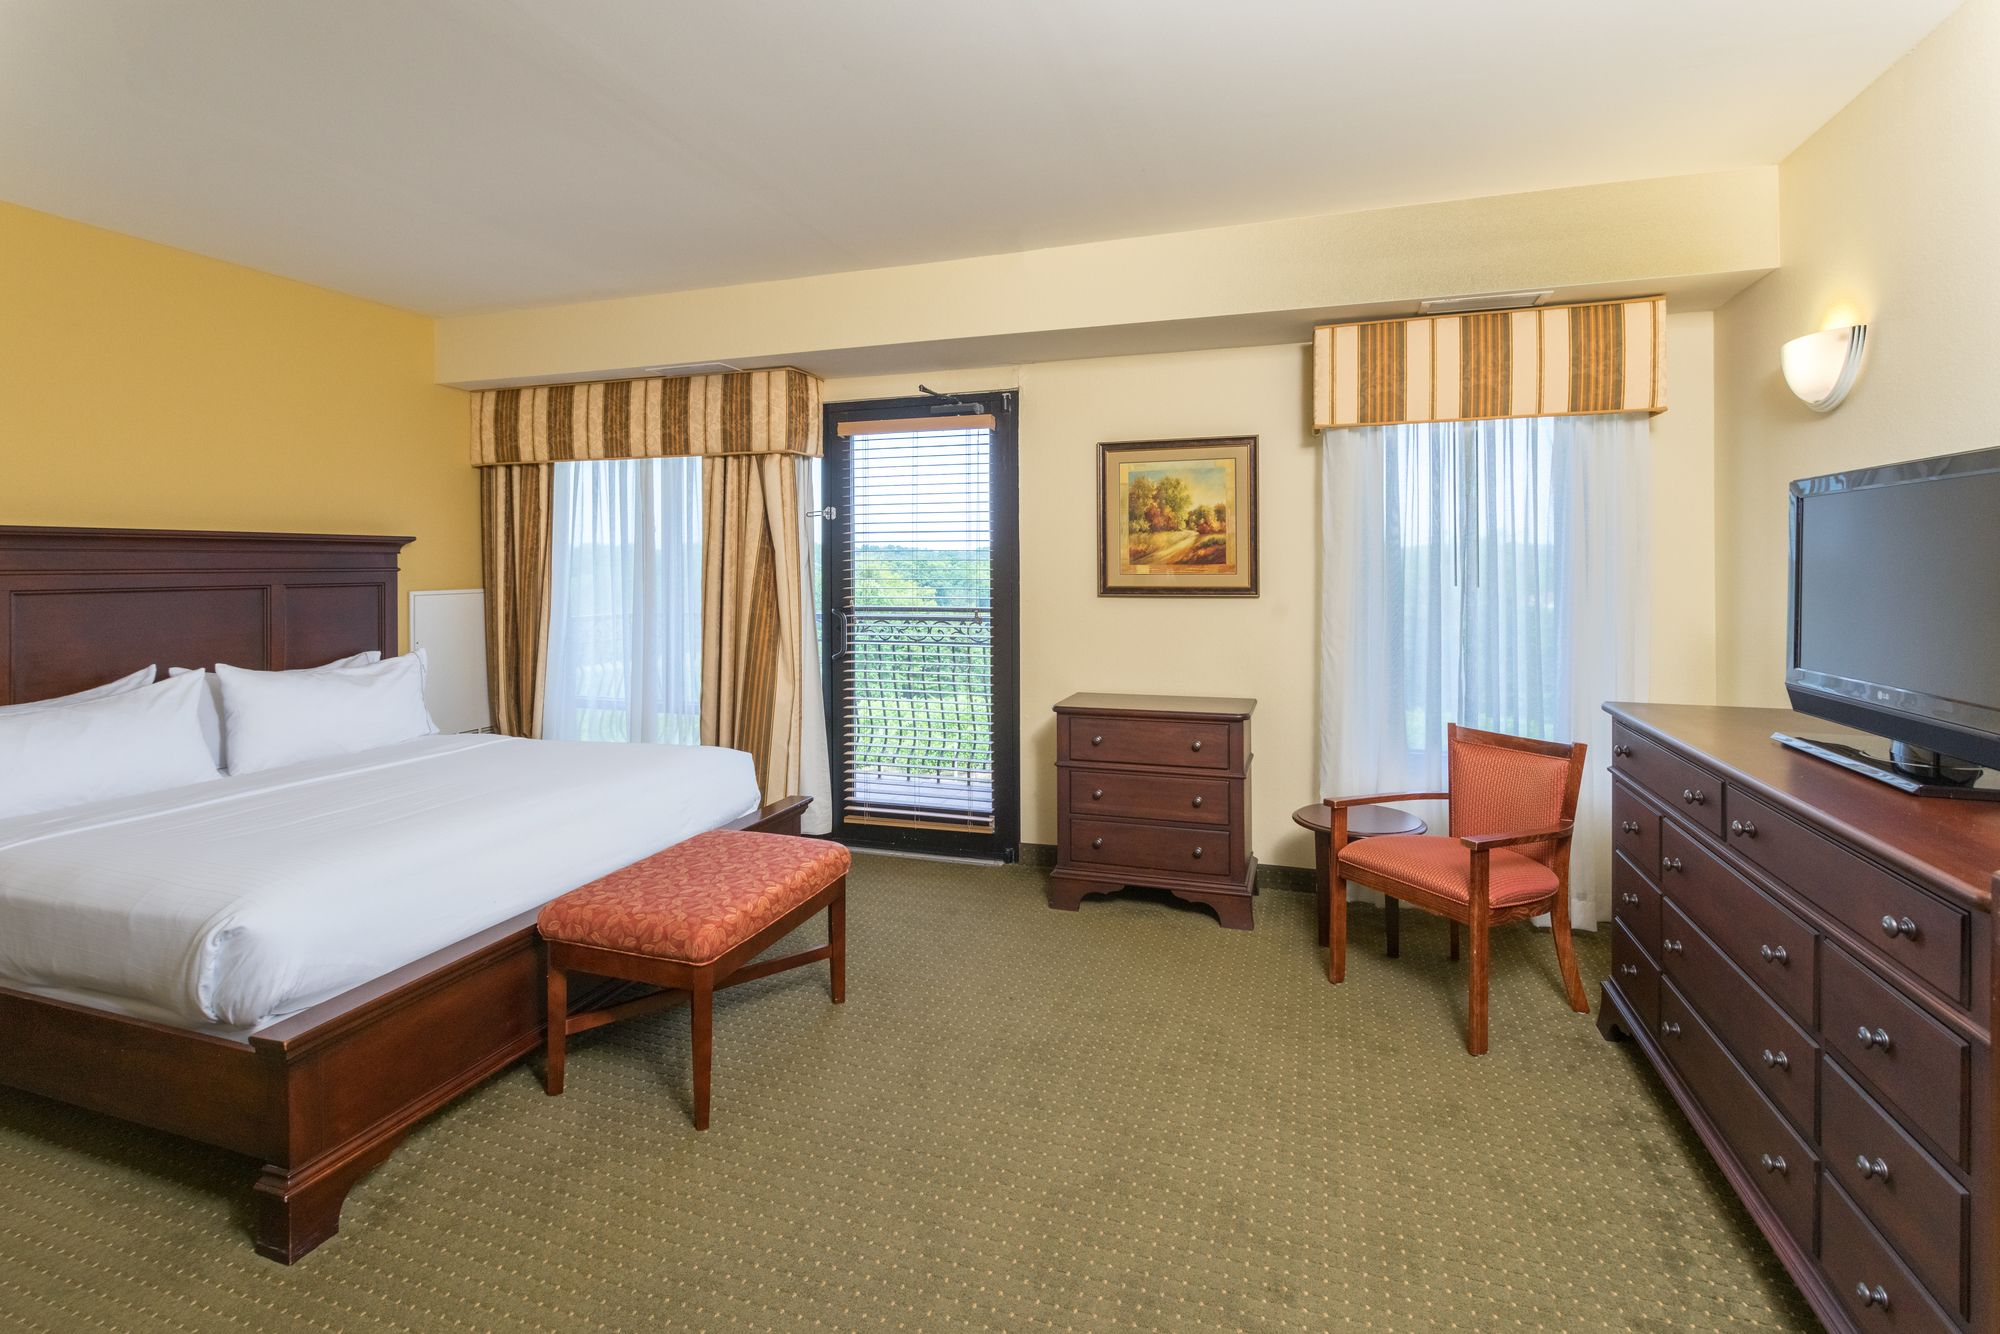 Holiday Inn Express Hotel & Suites Lexington NW-The Vineyard in Lexington, NC